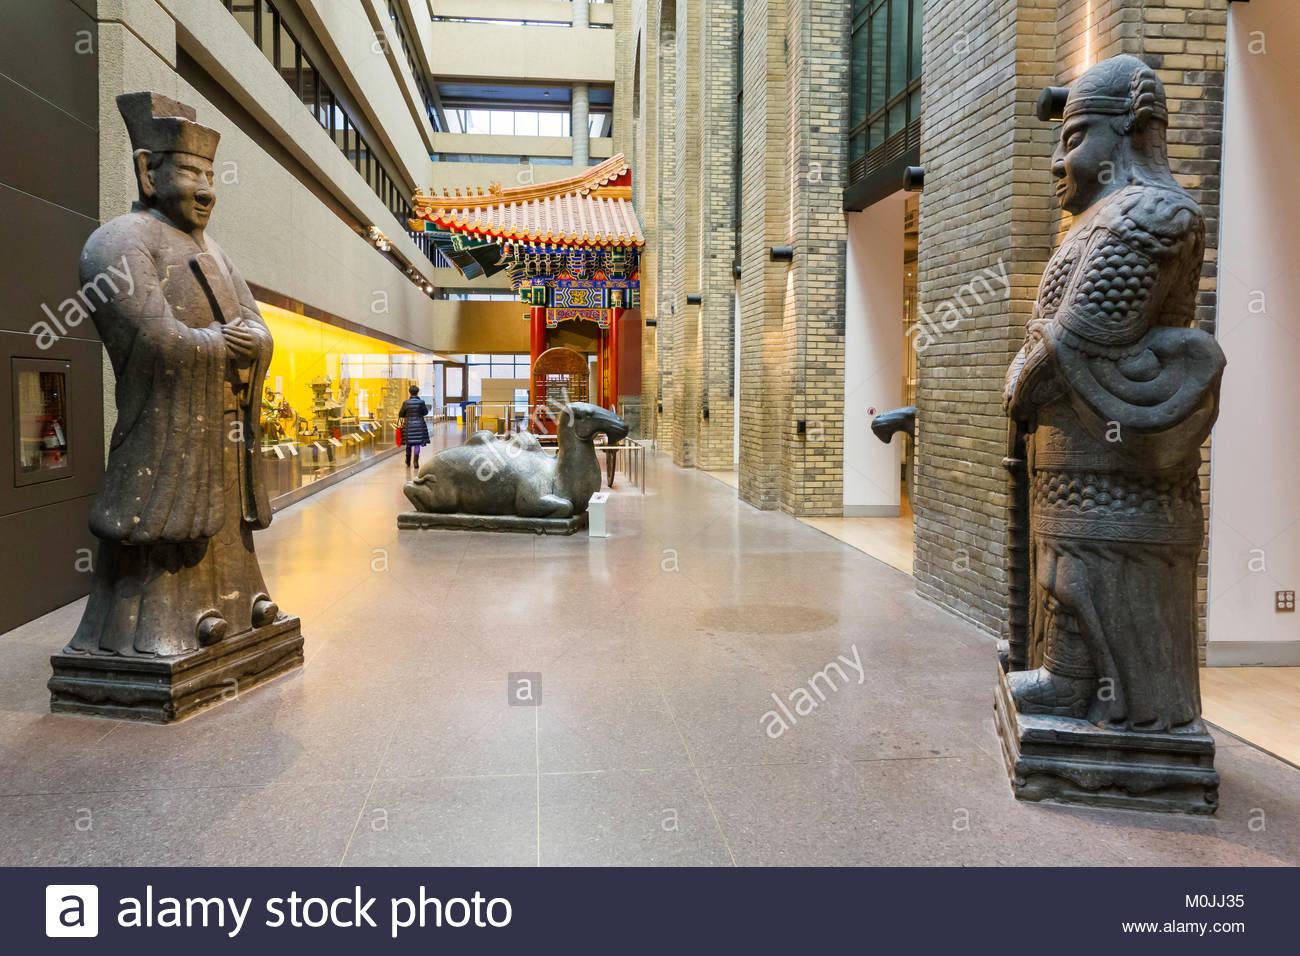 royal-ontario-museum-rom-chinese-archite